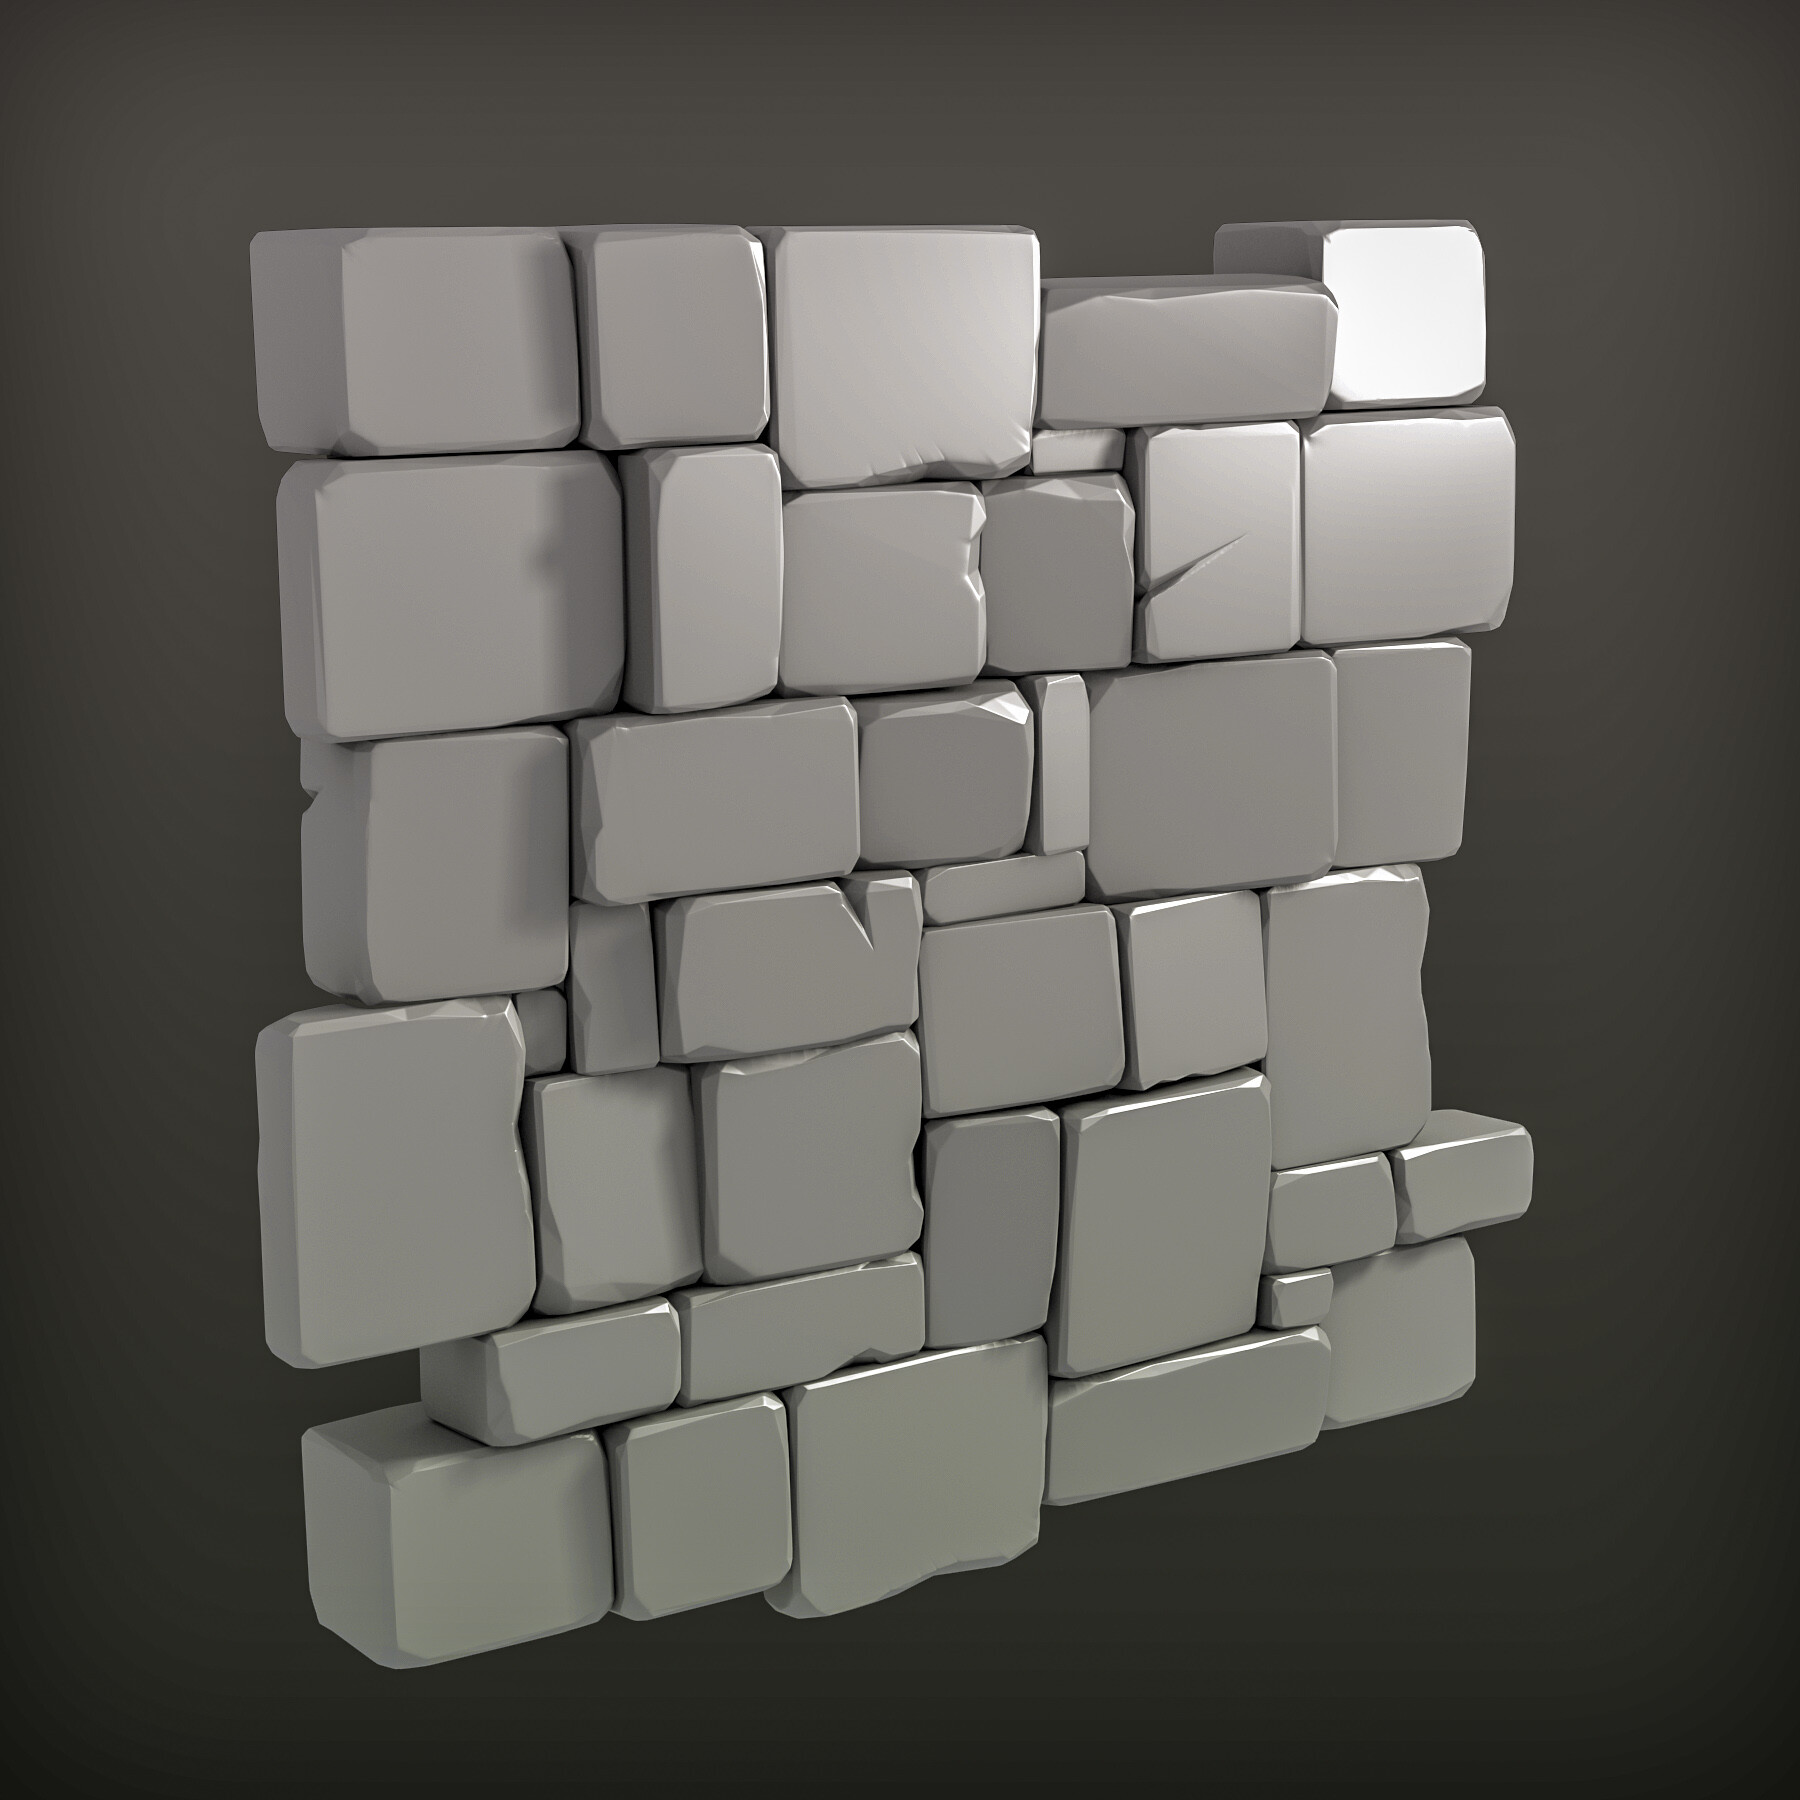 Martin teichmann stone wall render a